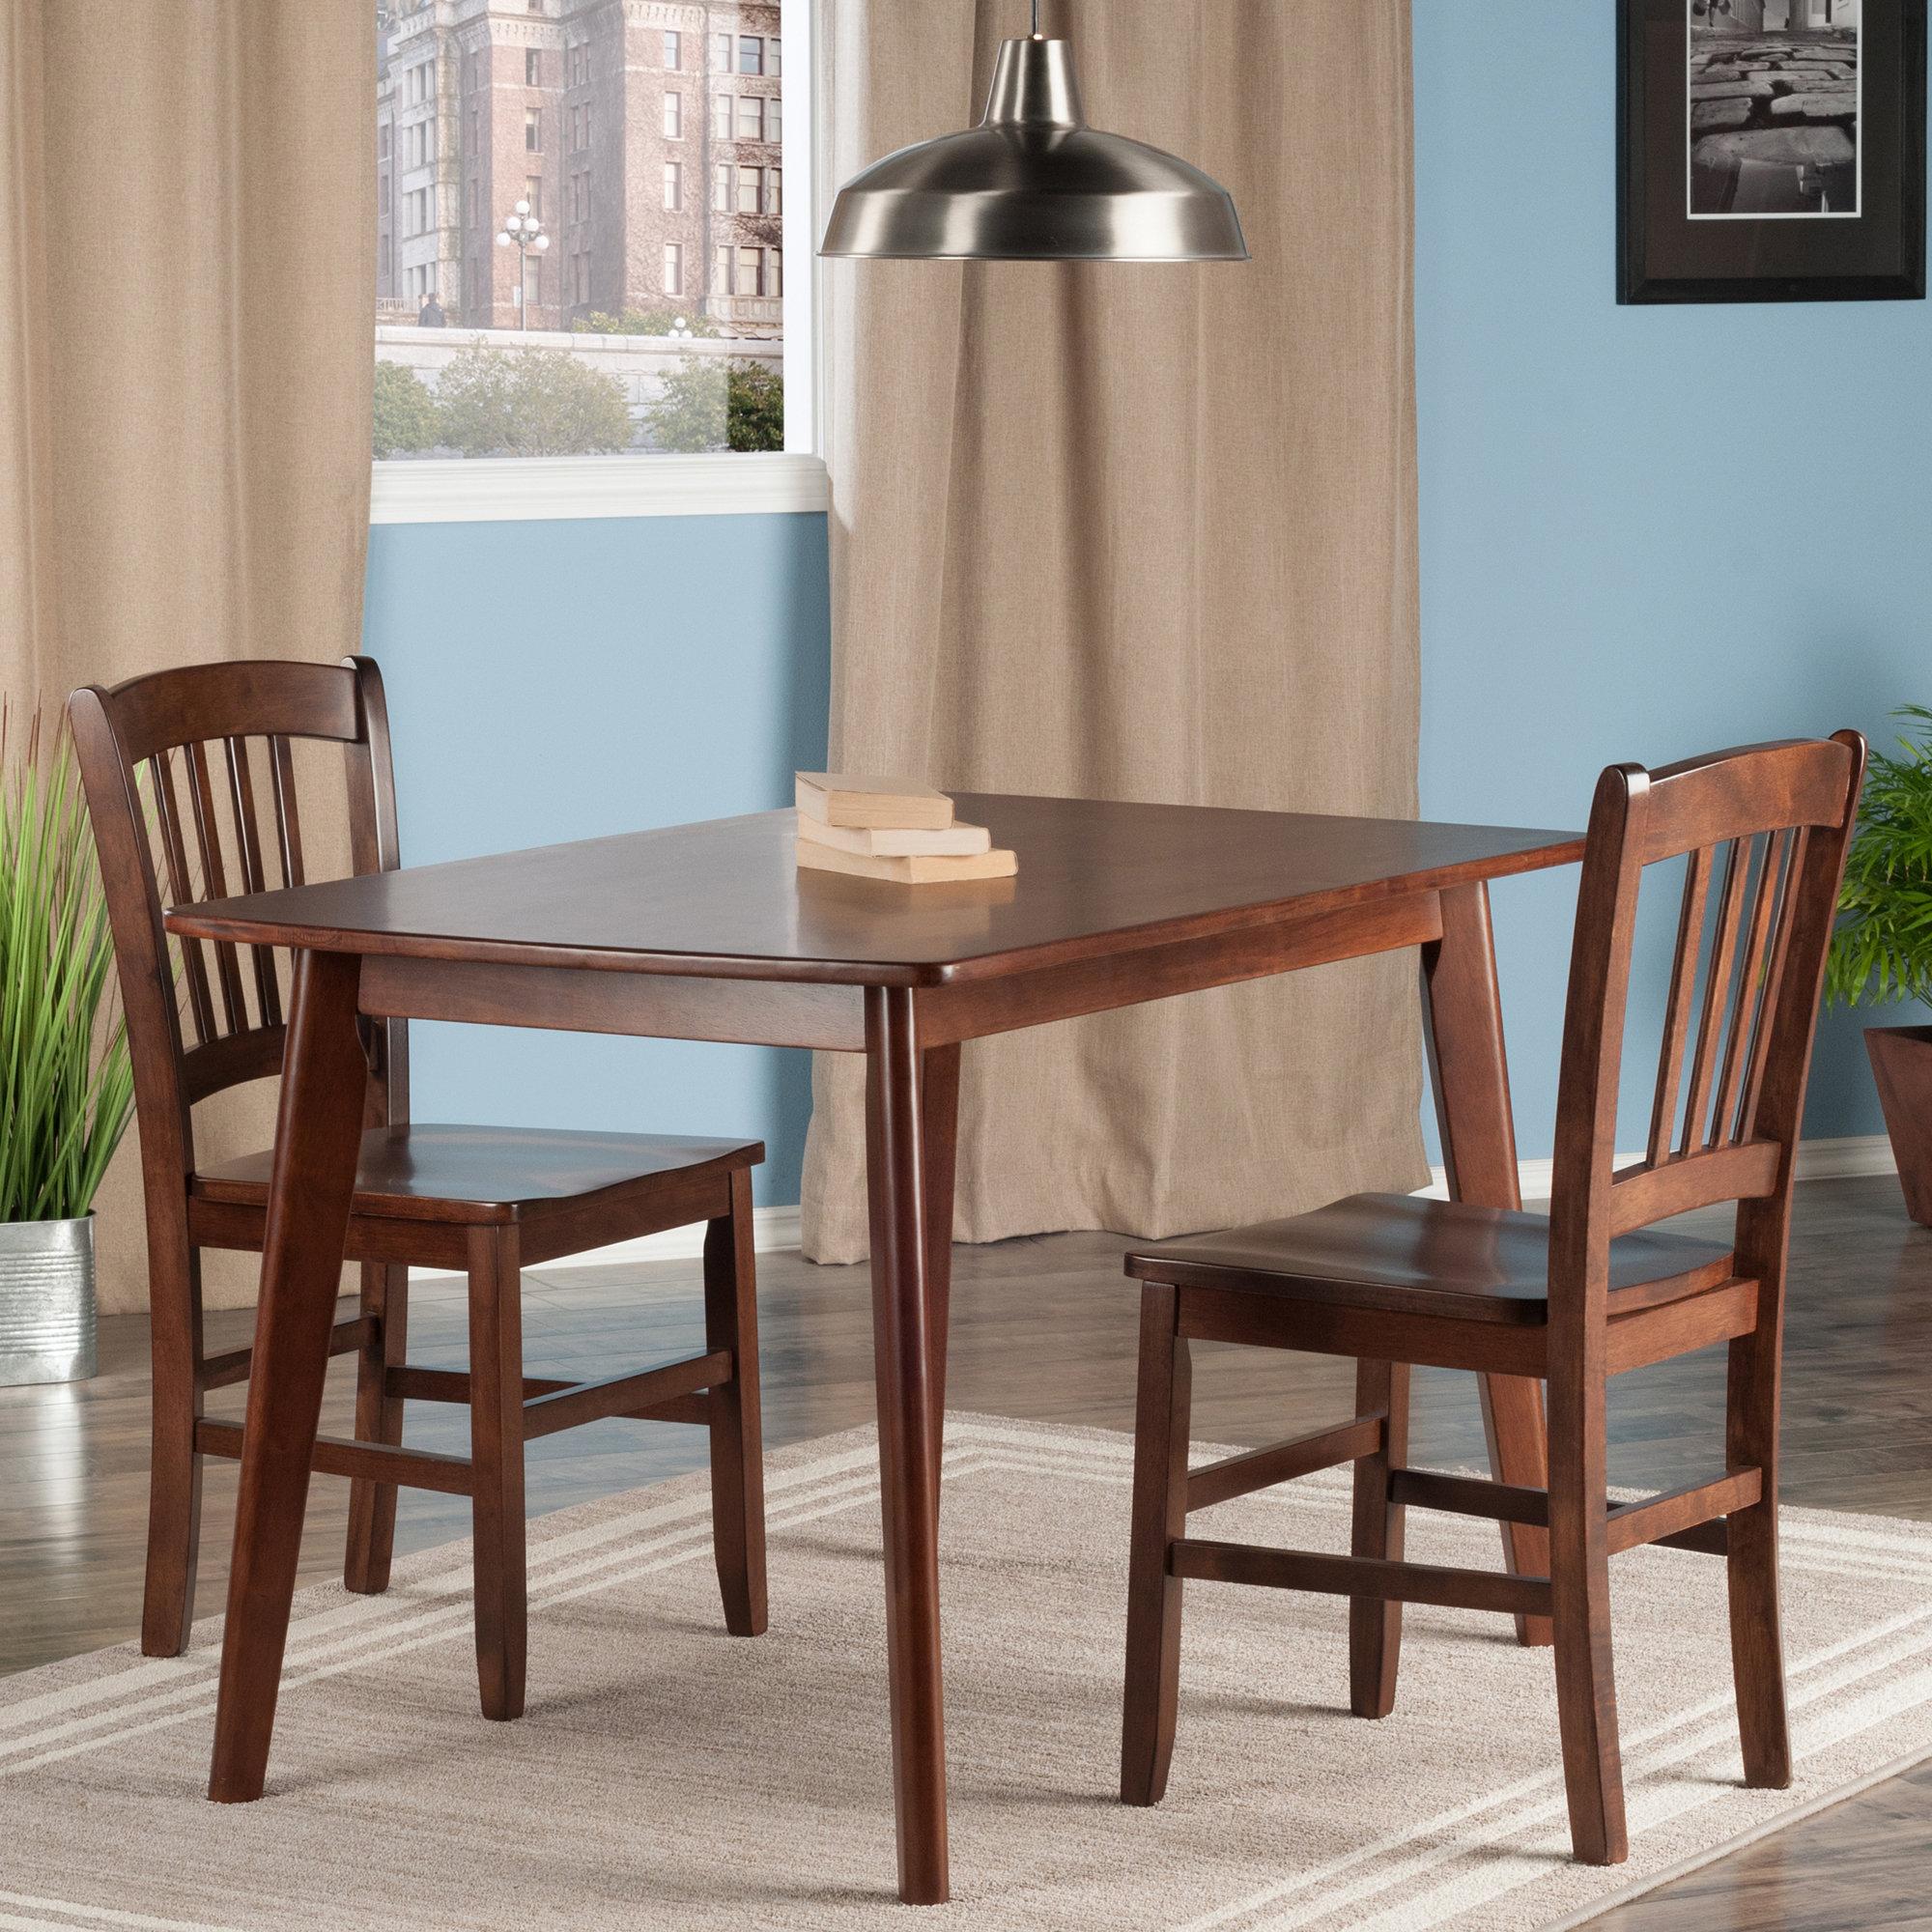 Details About Winston Porter Guynn 3 Piece Solid Wood Dining Set Wnst1156 Regarding Most Popular Yedinak 5 Piece Solid Wood Dining Sets (View 11 of 20)